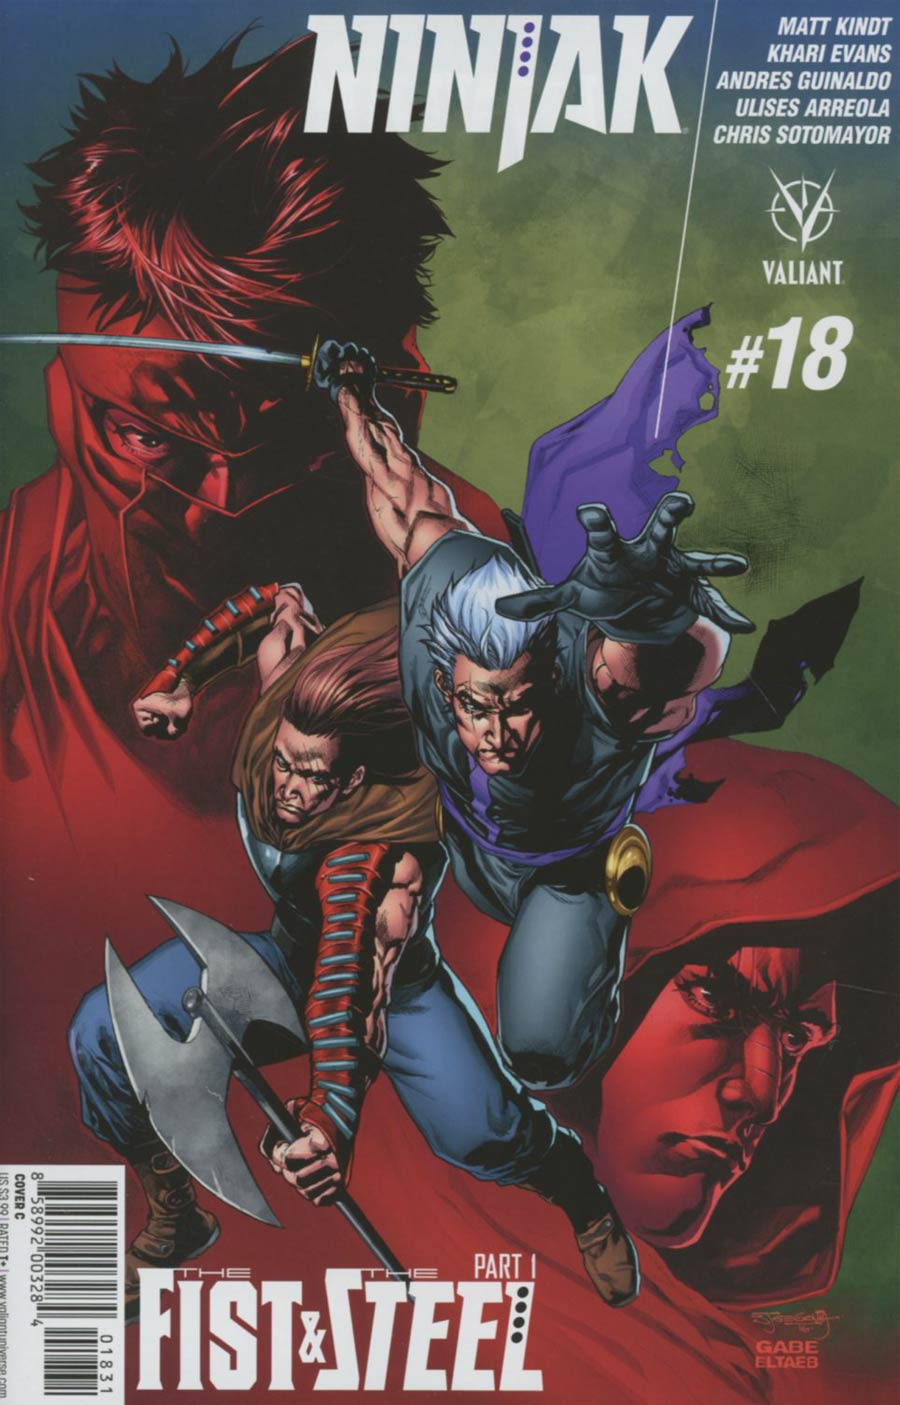 Ninjak Vol 3 #18 Cover C Variant Stephen Segovia Cover